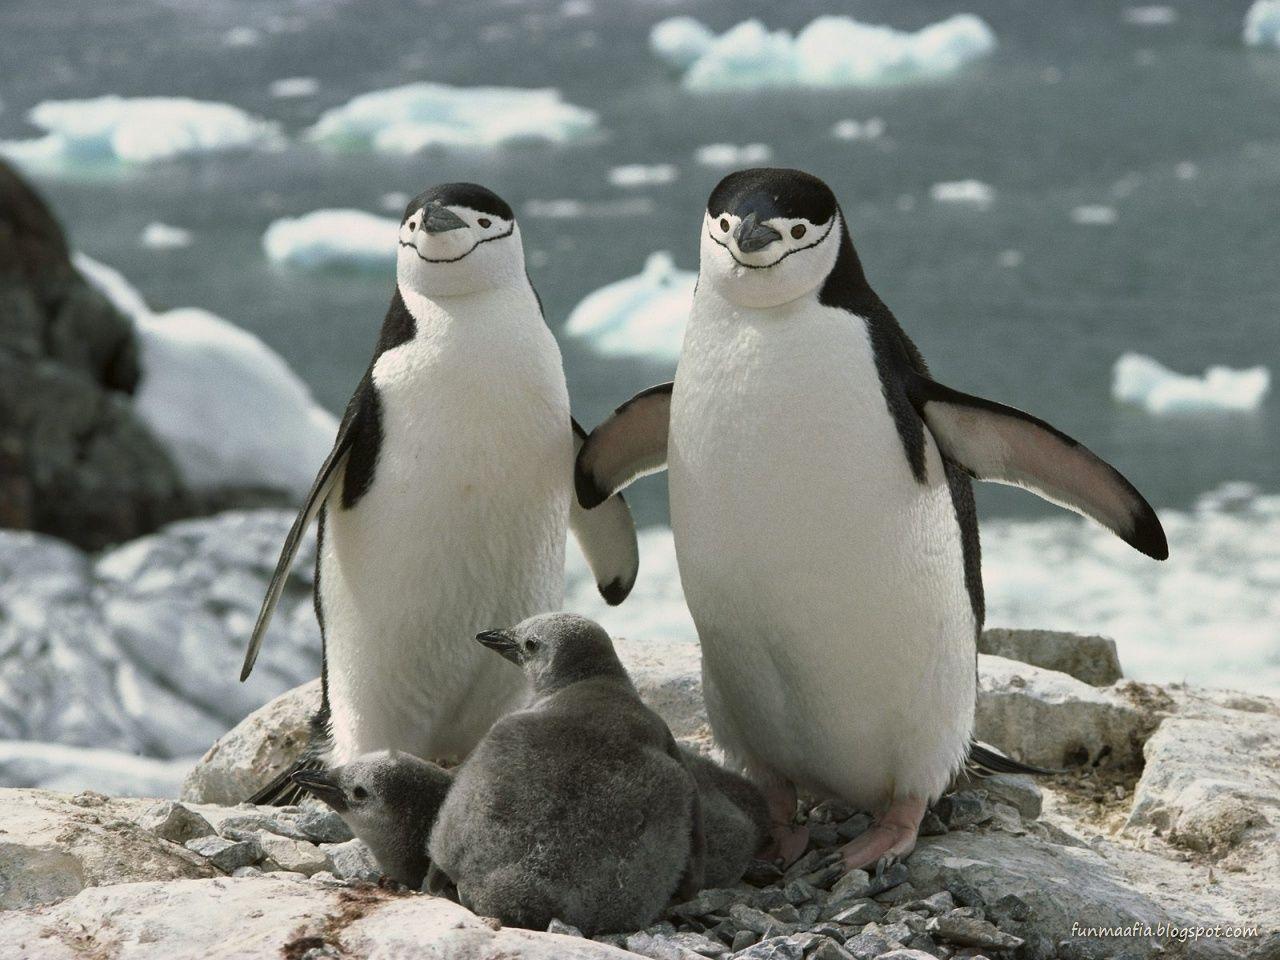 http://3.bp.blogspot.com/-S7lLuTgtqwU/TolIuBm1NlI/AAAAAAAACDE/vosPmDwgiLI/s1600/Penguins-Family-wildlife-wallpaper.jpg